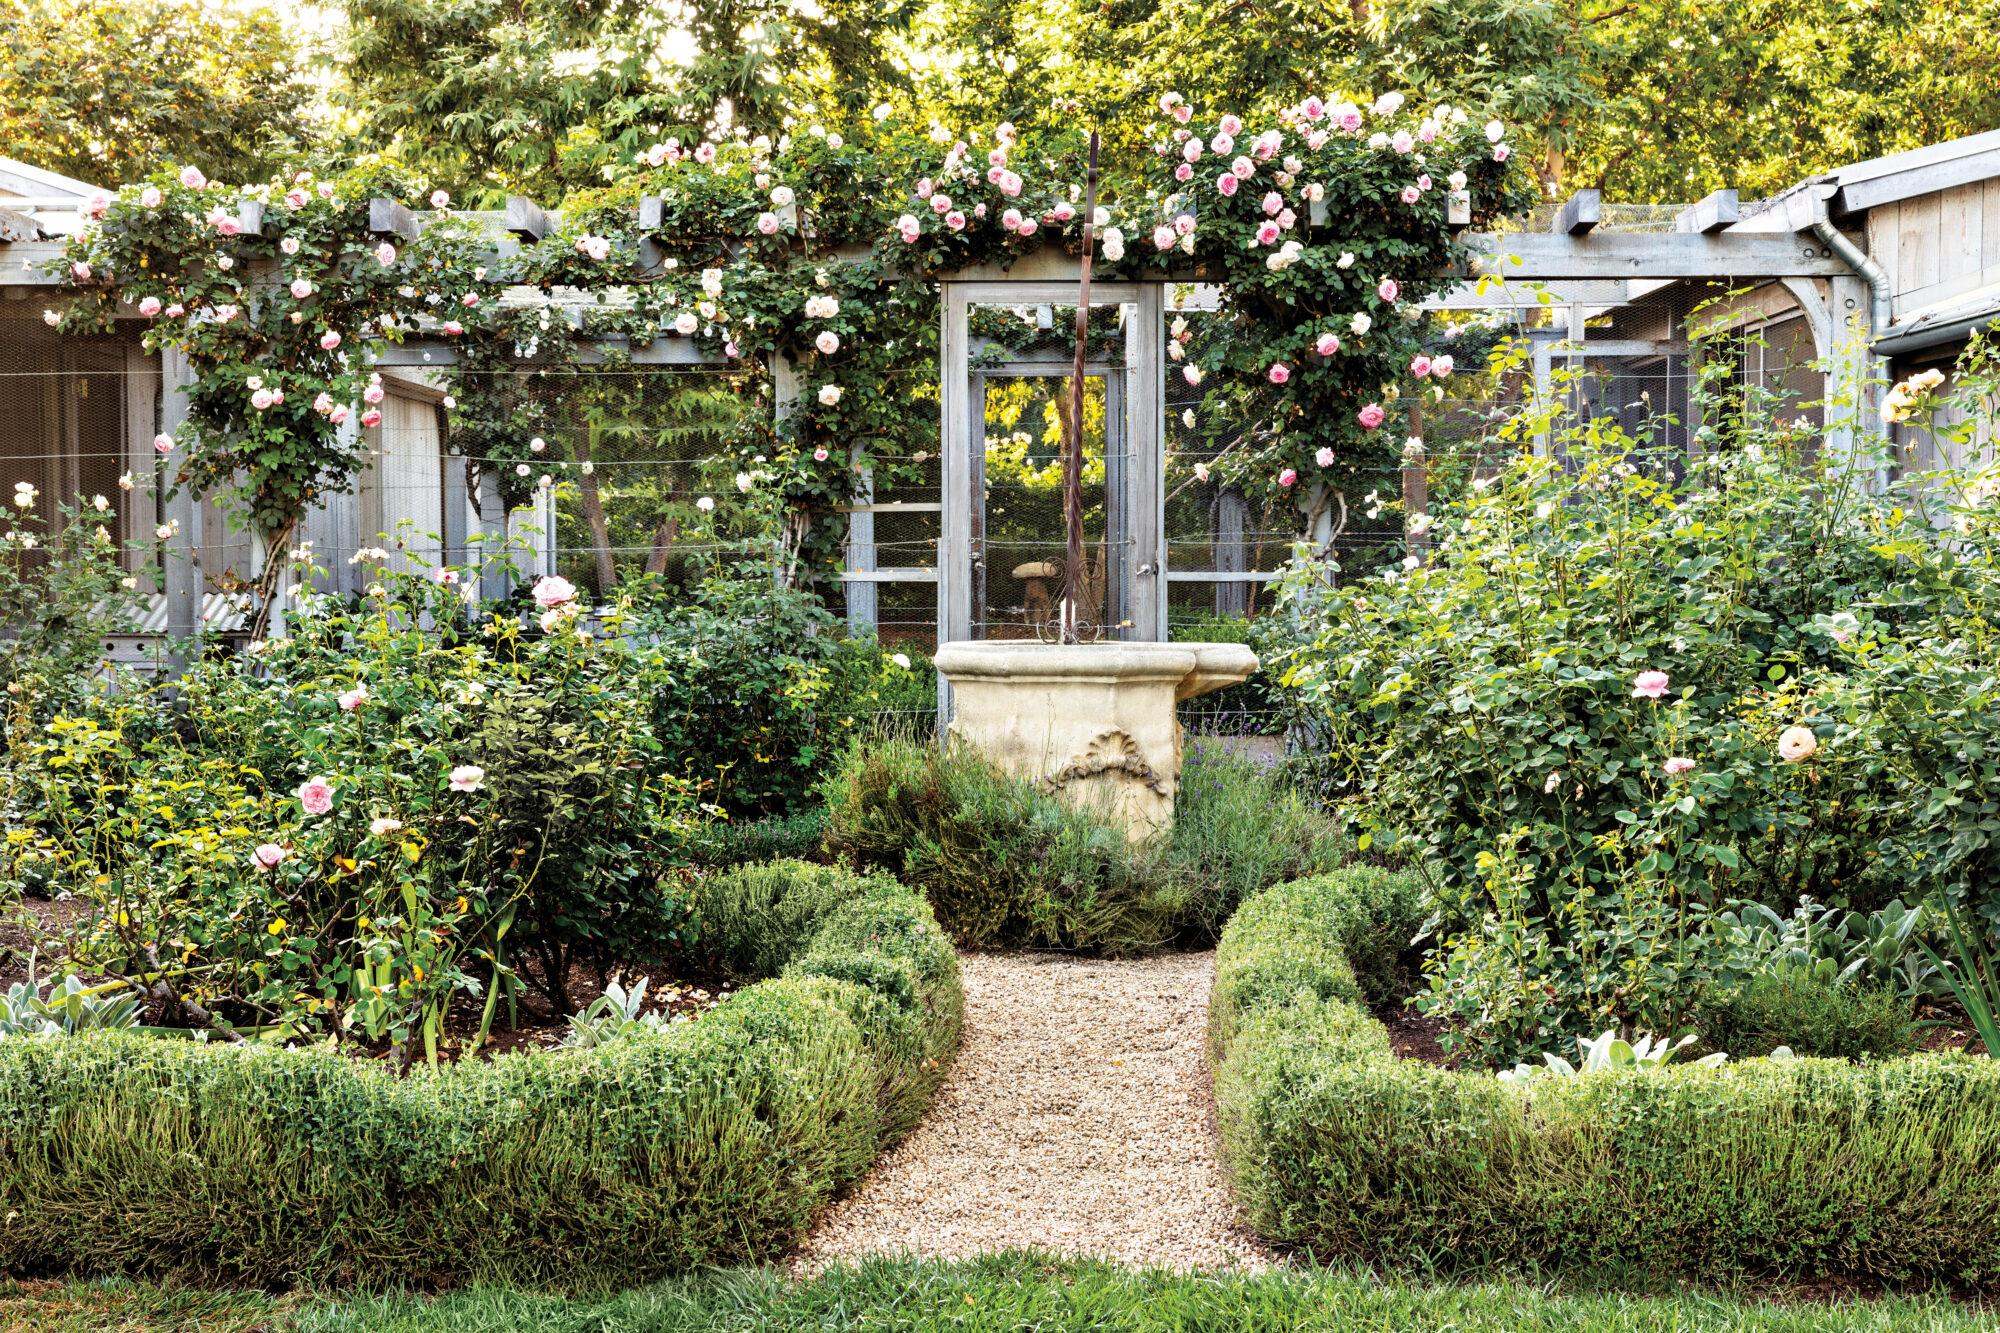 Gianetti's Garden